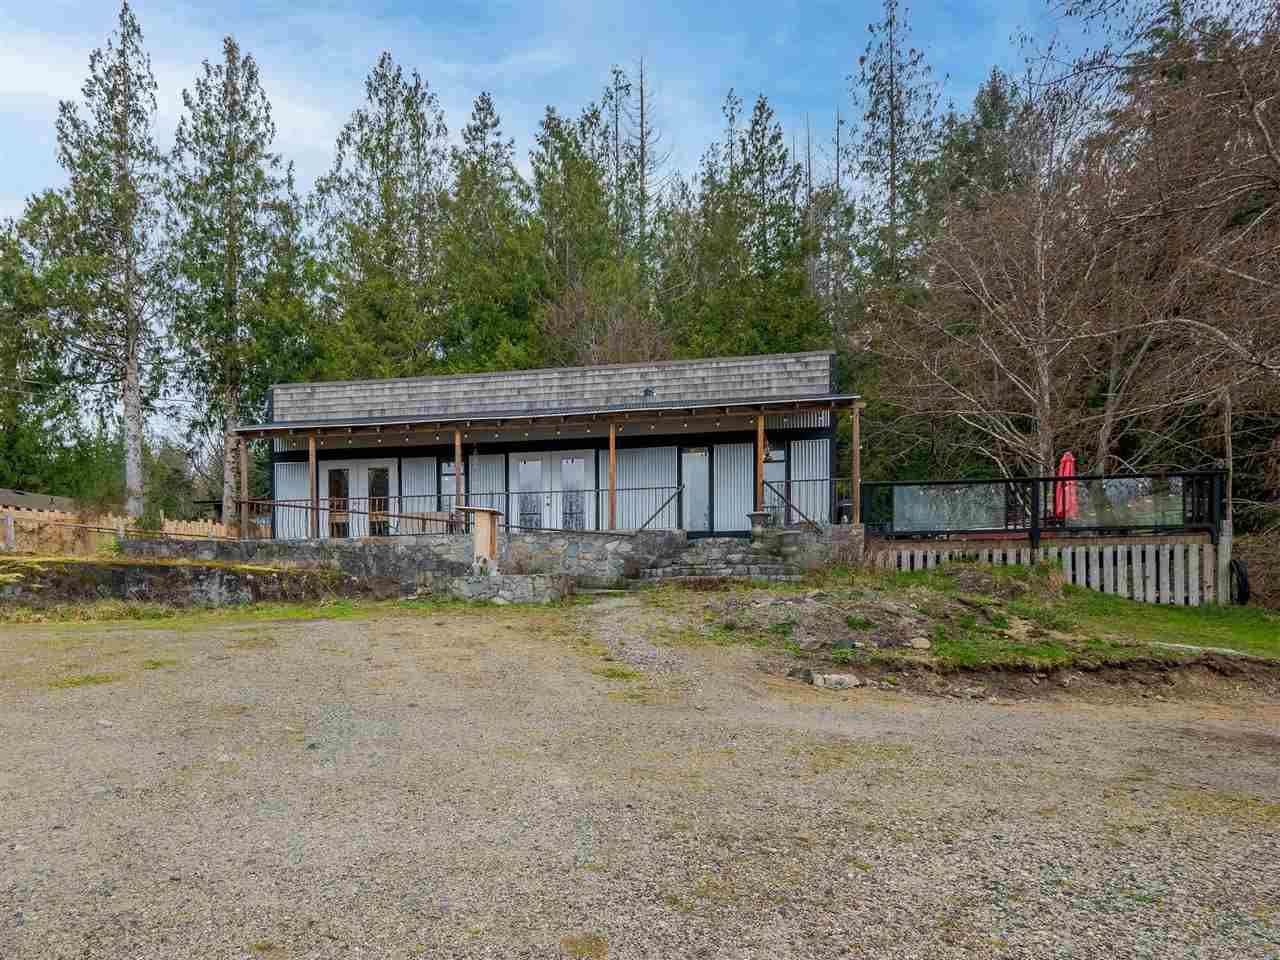 Main Photo: 4591 4581 FRANCIS PENINSULA Road in Sechelt: Pender Harbour Egmont House for sale (Sunshine Coast)  : MLS®# R2555672